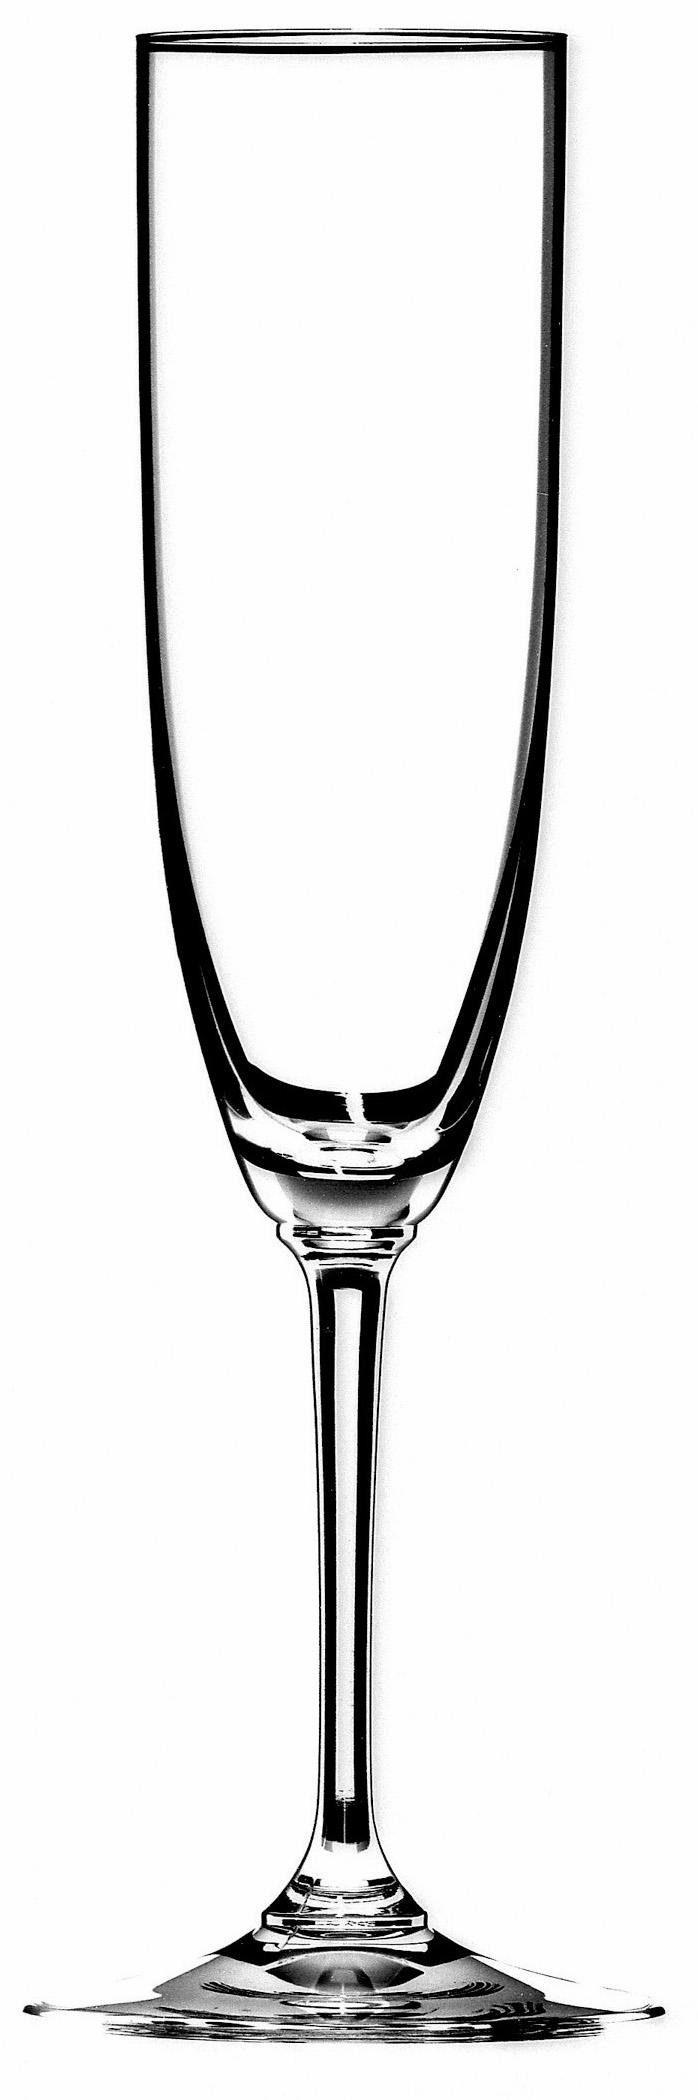 RIEDEL GLASS Sektglas, Champagner, Made in Germany, »Vinum«